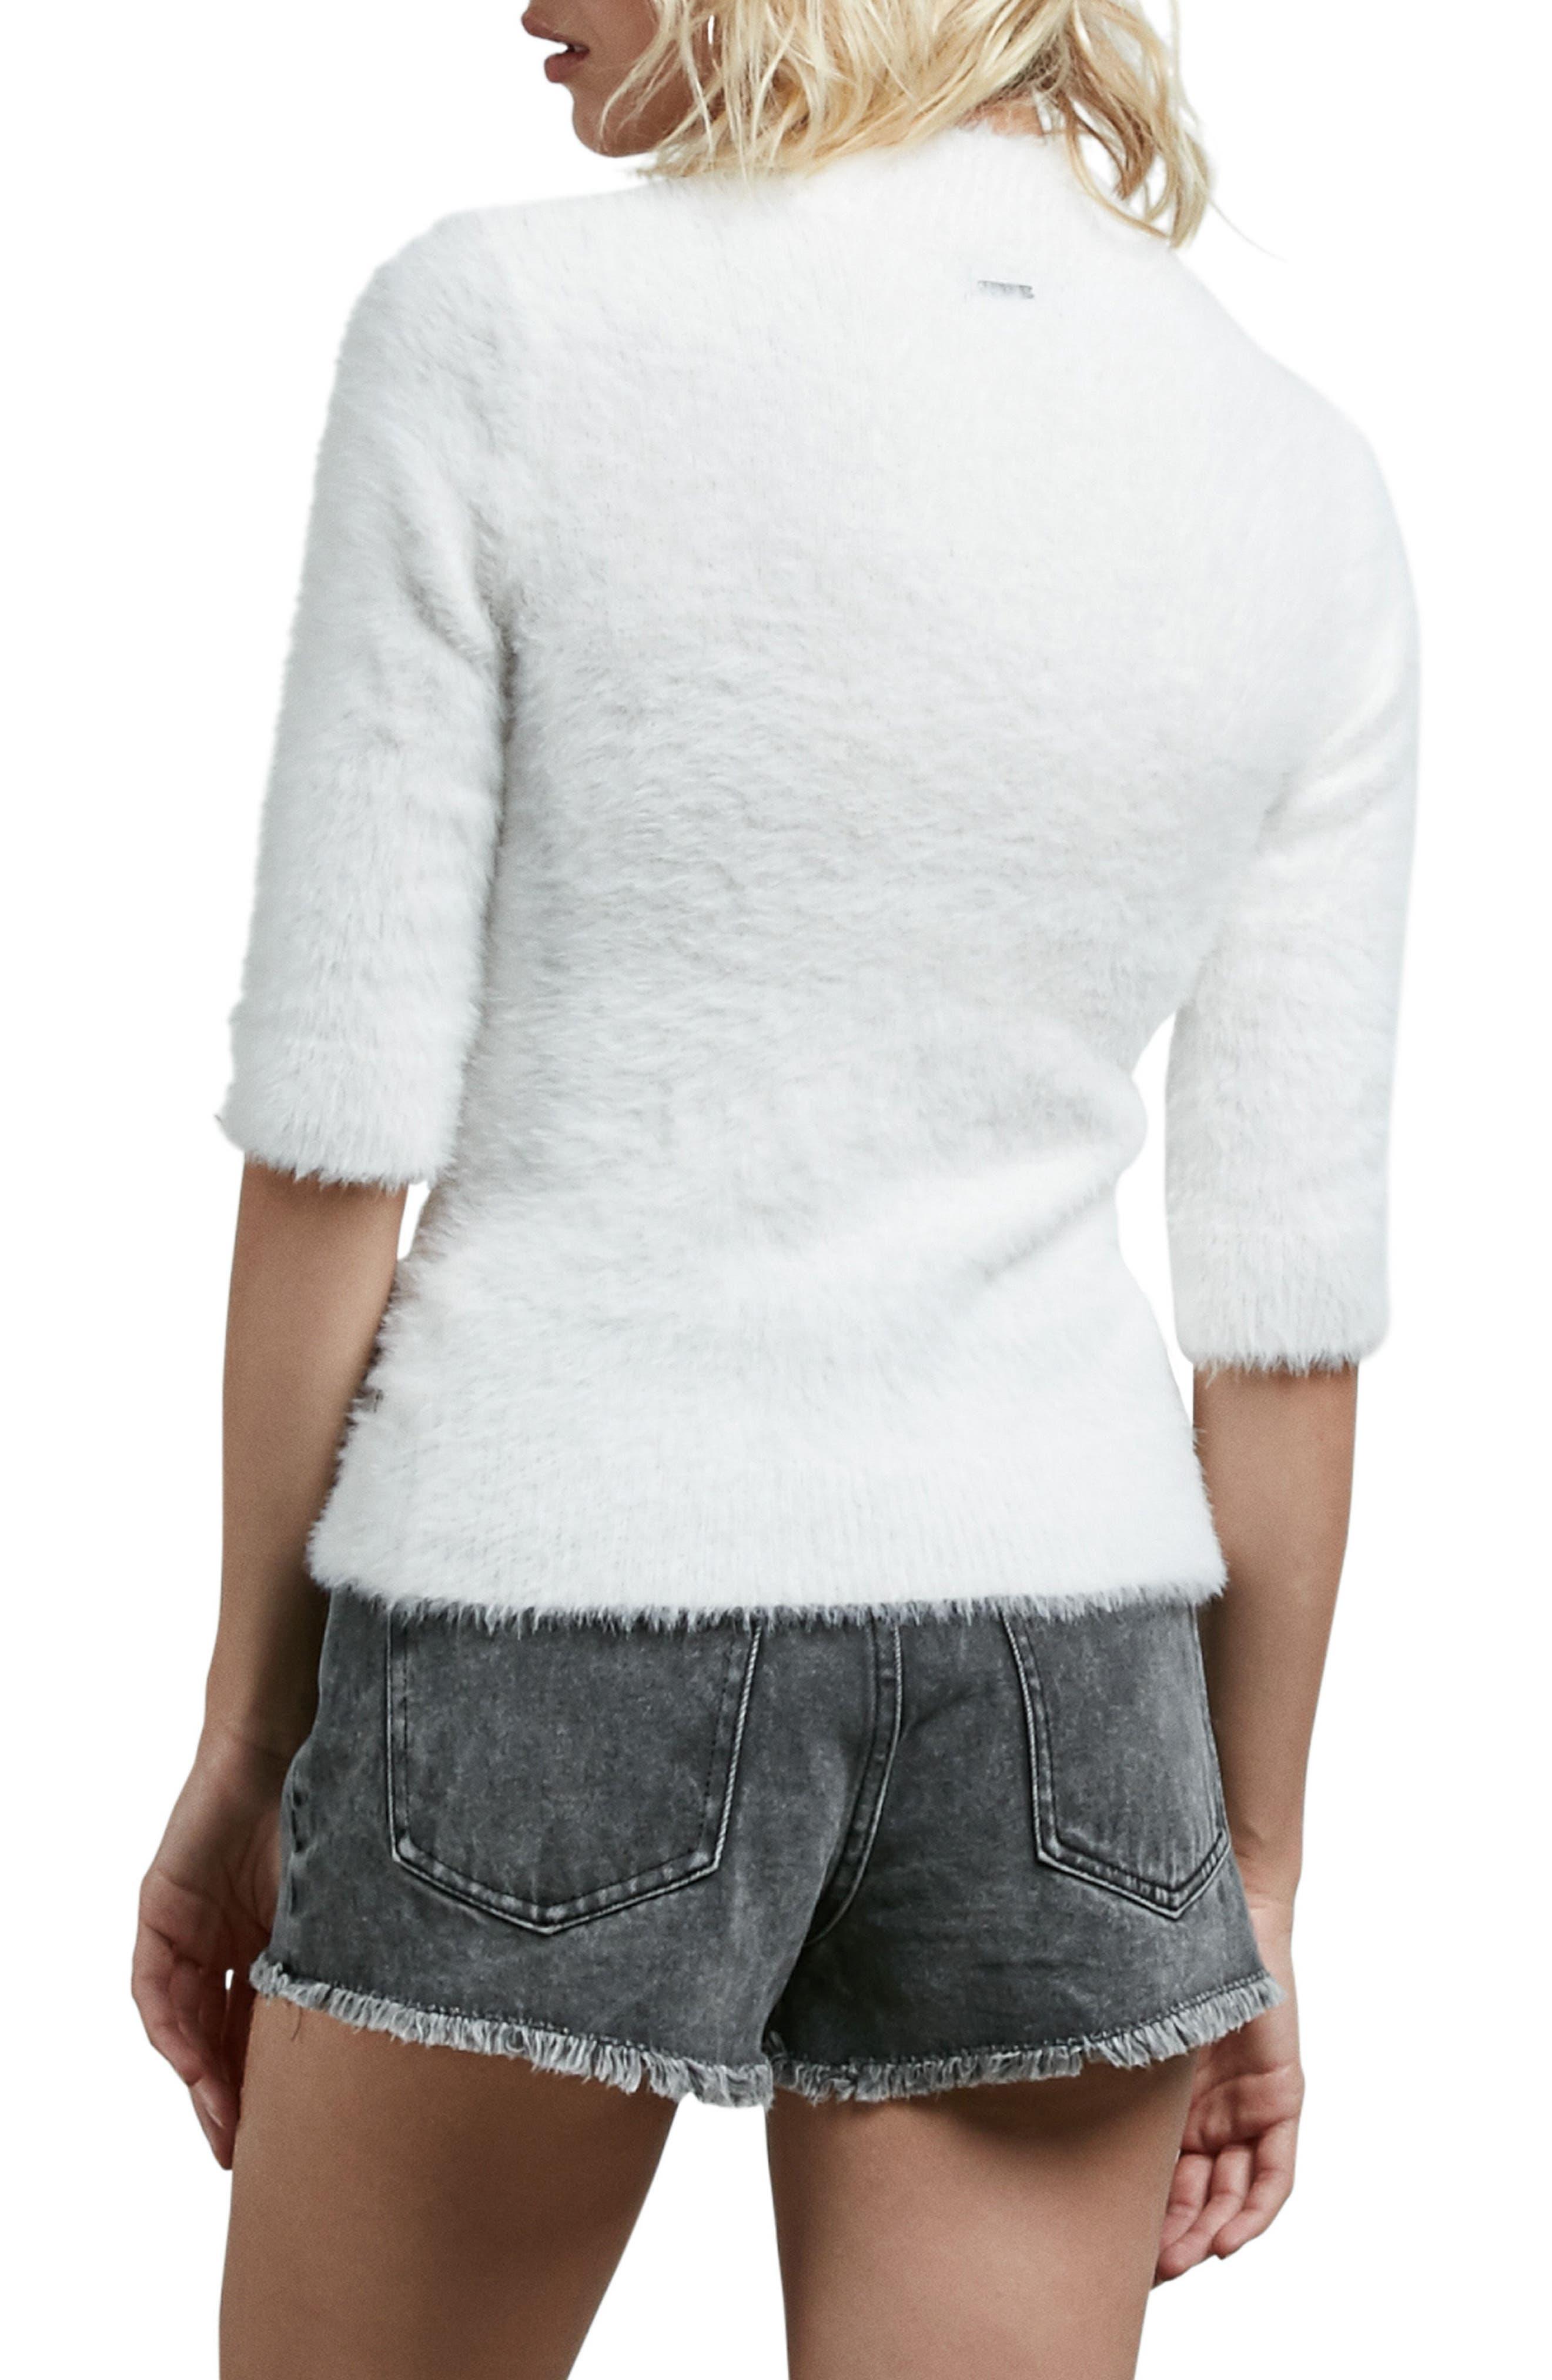 Bunney Riot Sweater,                             Alternate thumbnail 2, color,                             109